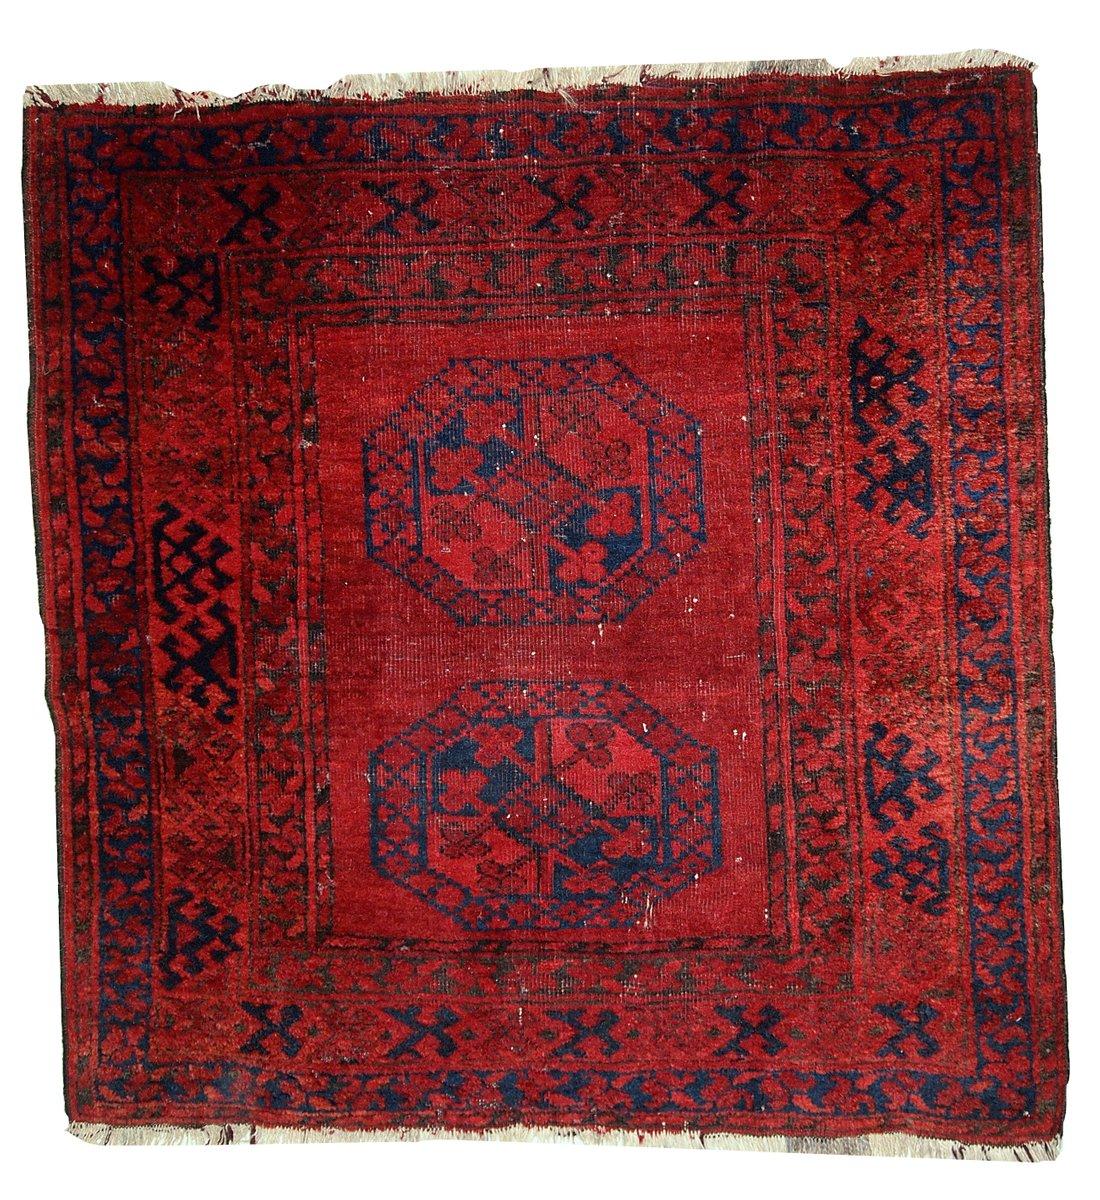 Antique Afghan Rugs: Antique Handmade Afghan Ersari Rug, 1900s For Sale At Pamono